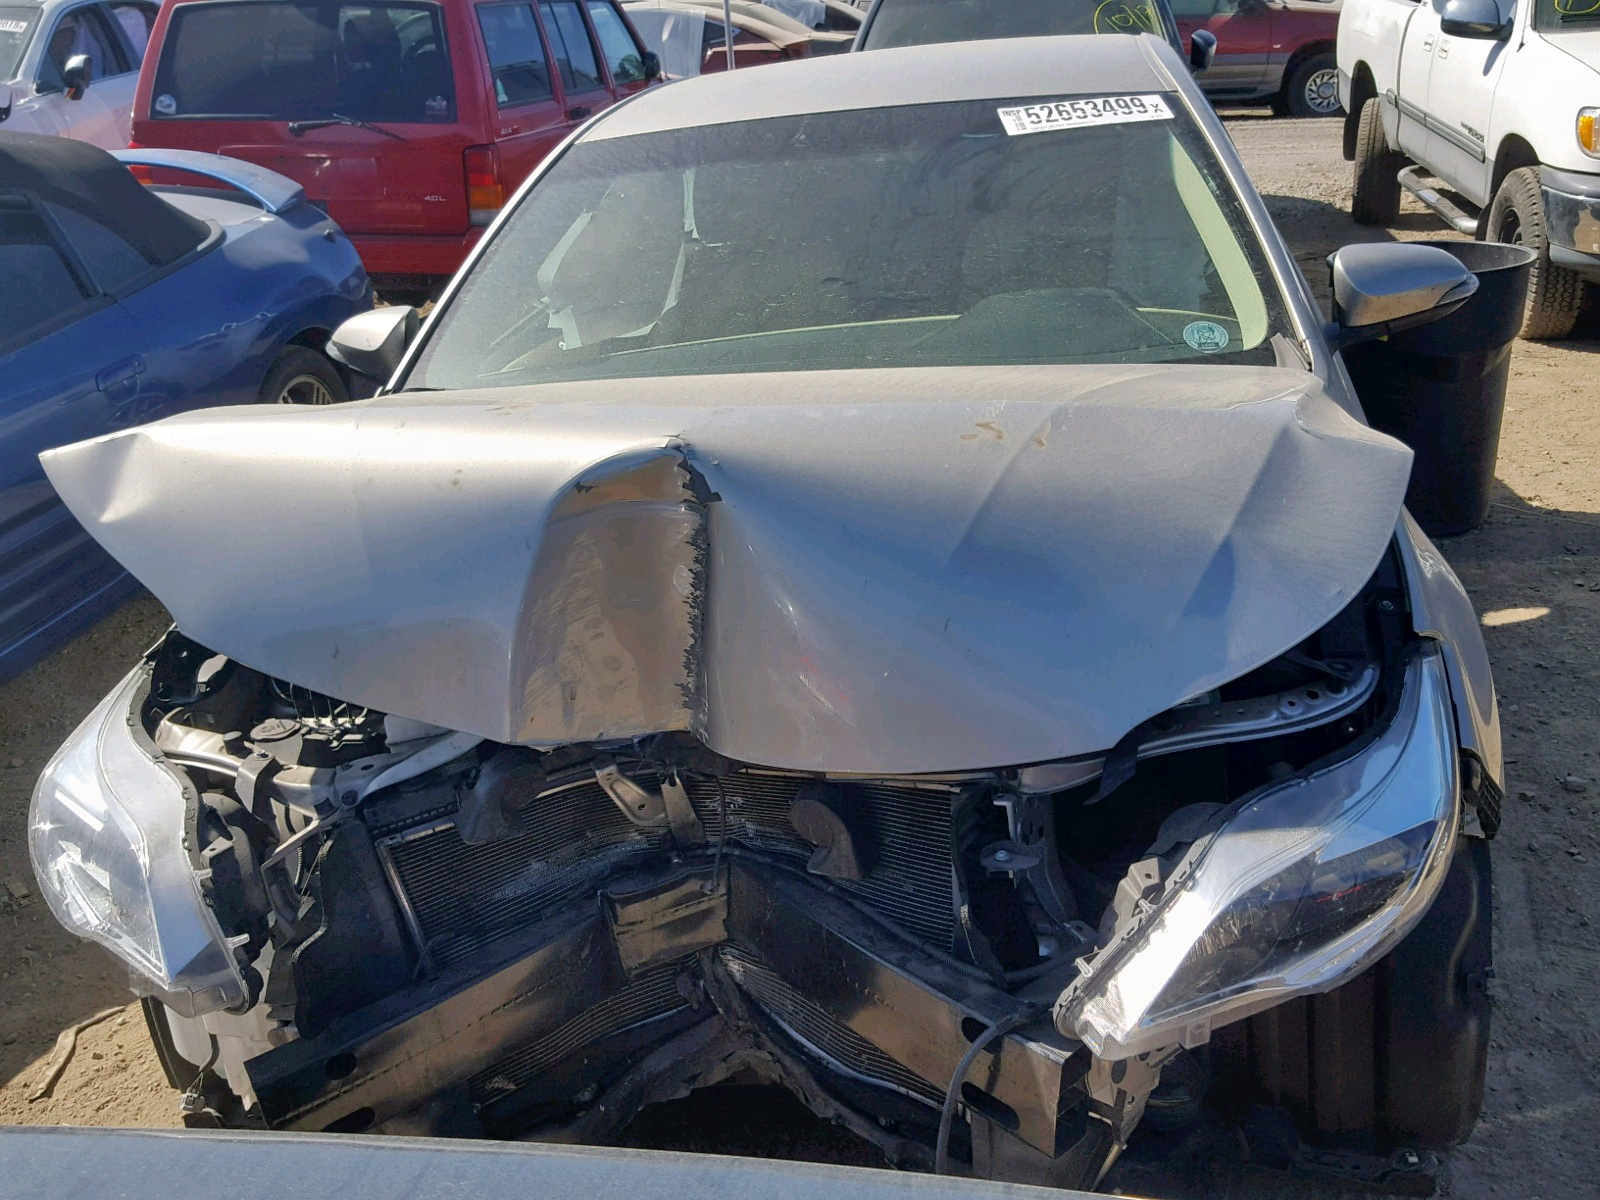 4T1BK1EB0DU021931 - 2013 Toyota Avalon Bas 3.5L inside view